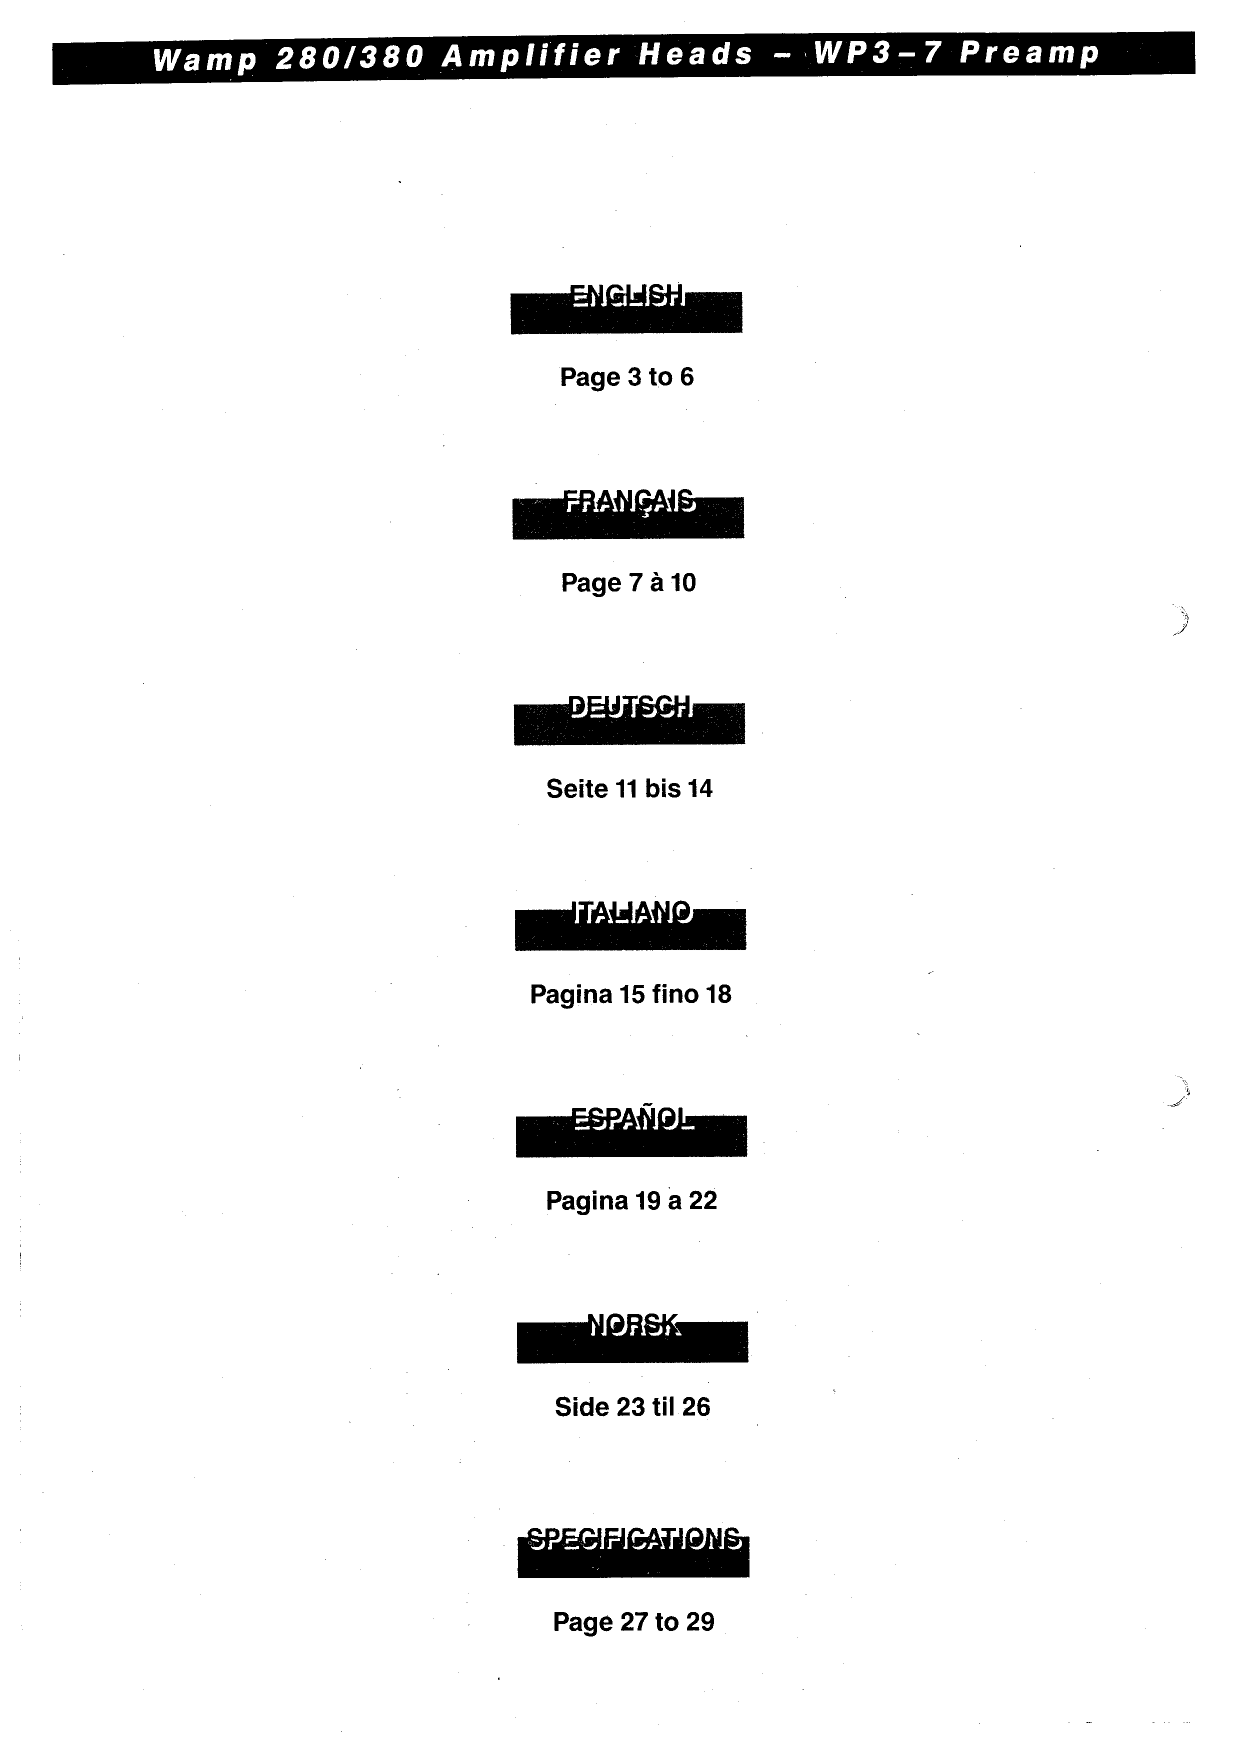 PDF manual for Warwick Amp Wamp 380